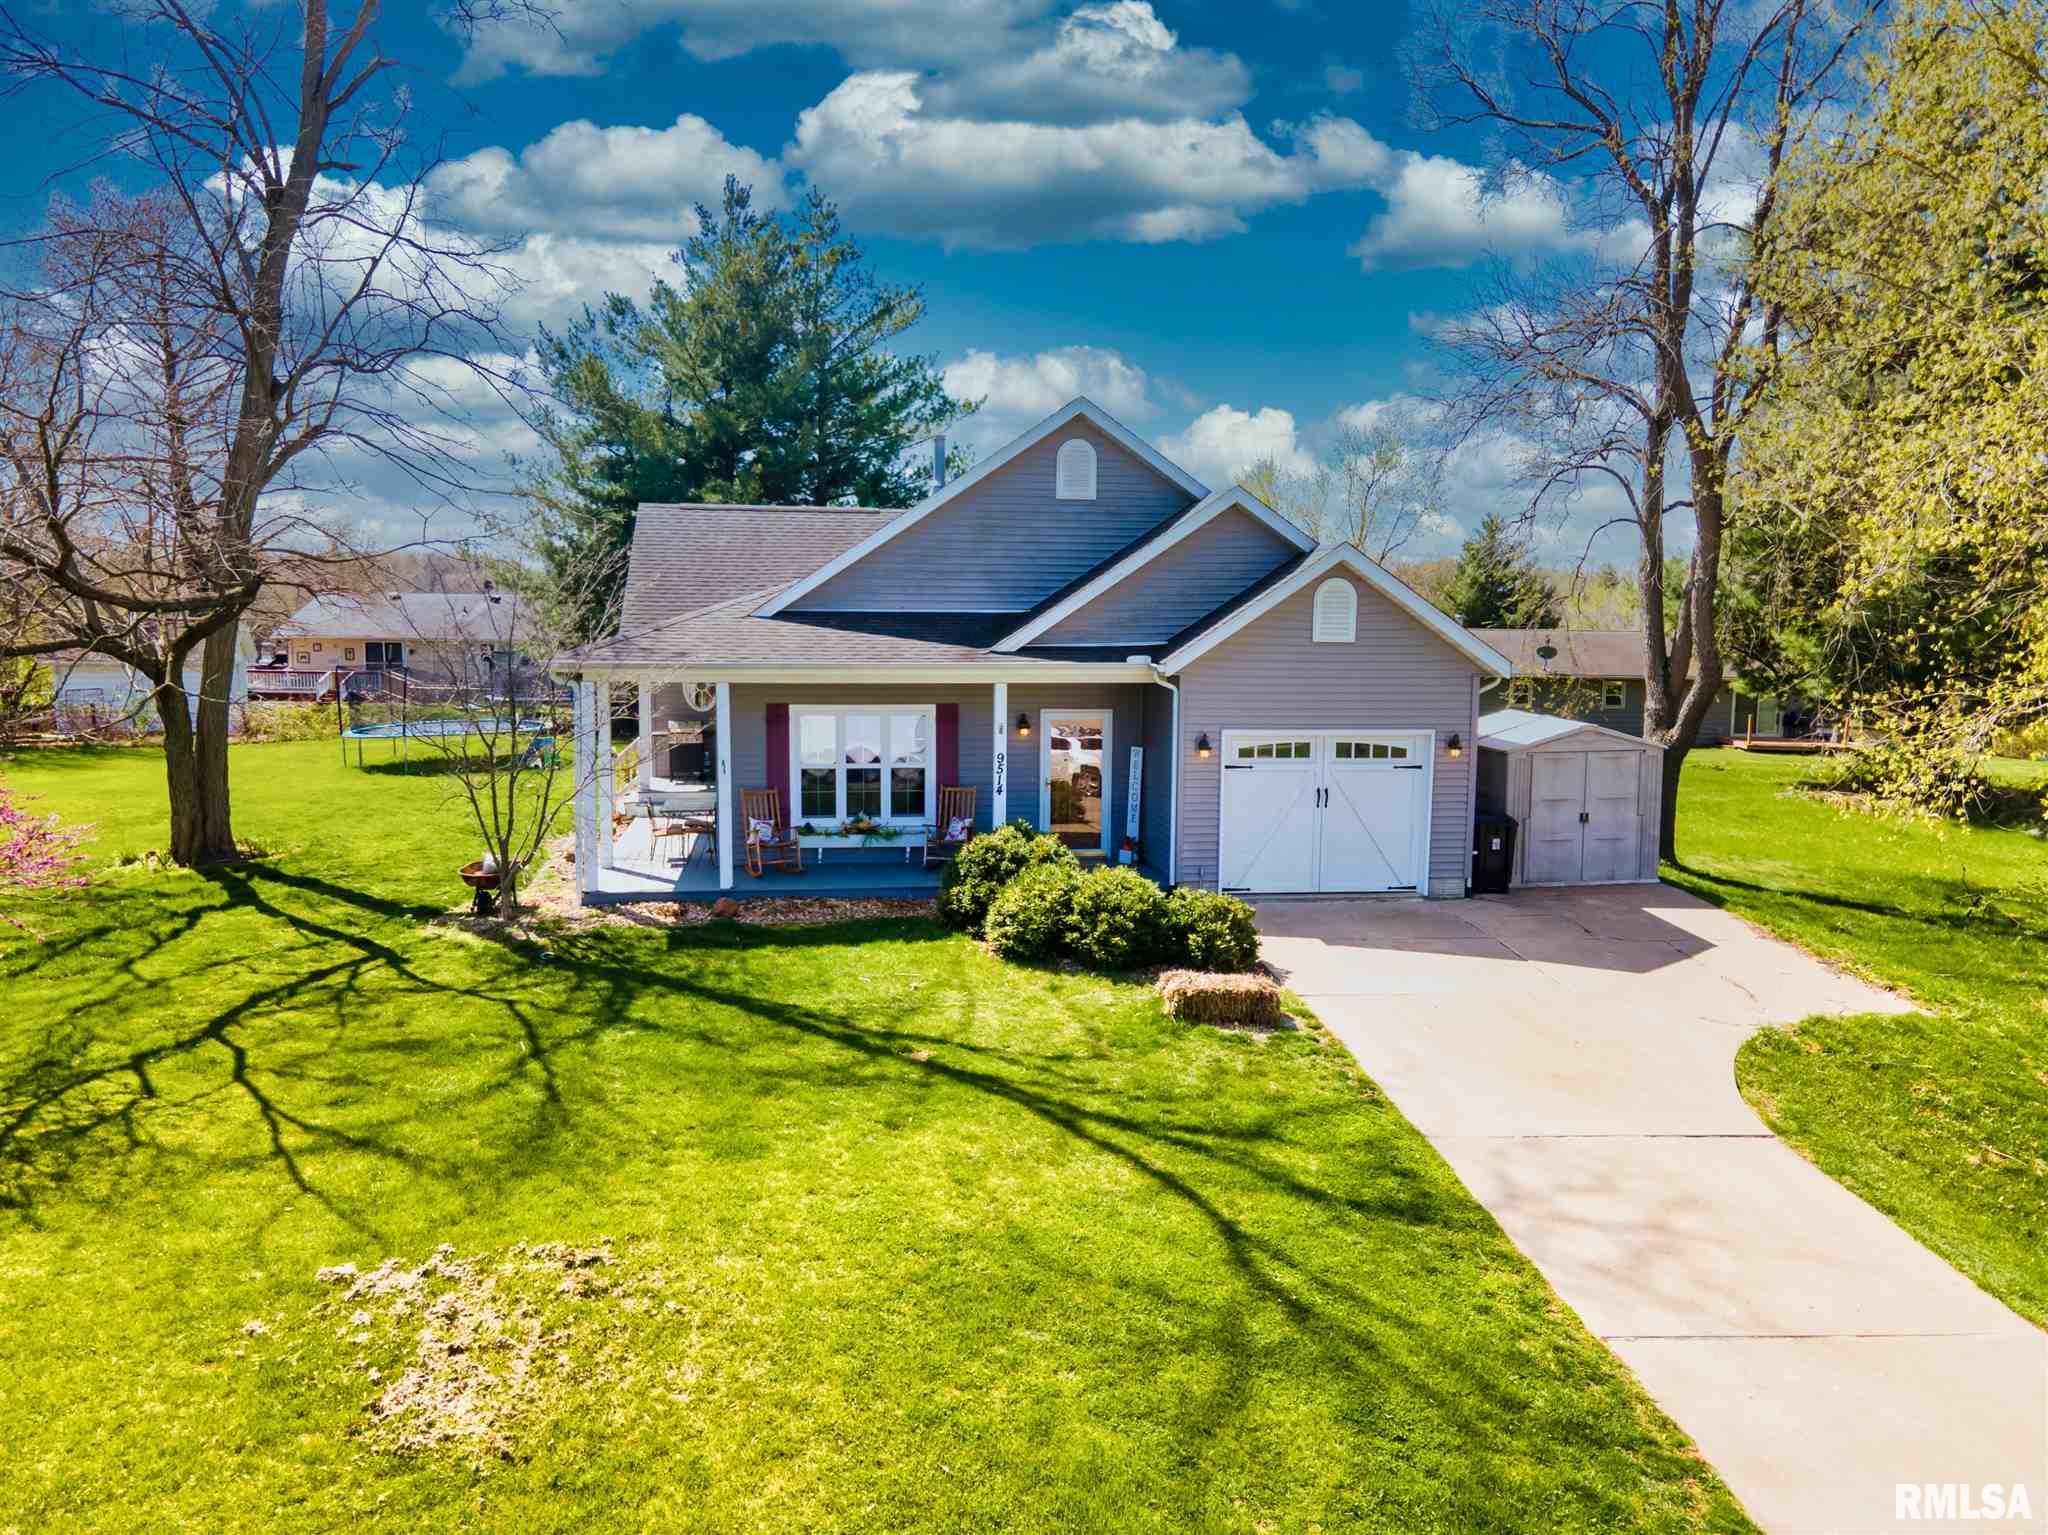 9514 W PELLINORE Property Photo - Mapleton, IL real estate listing